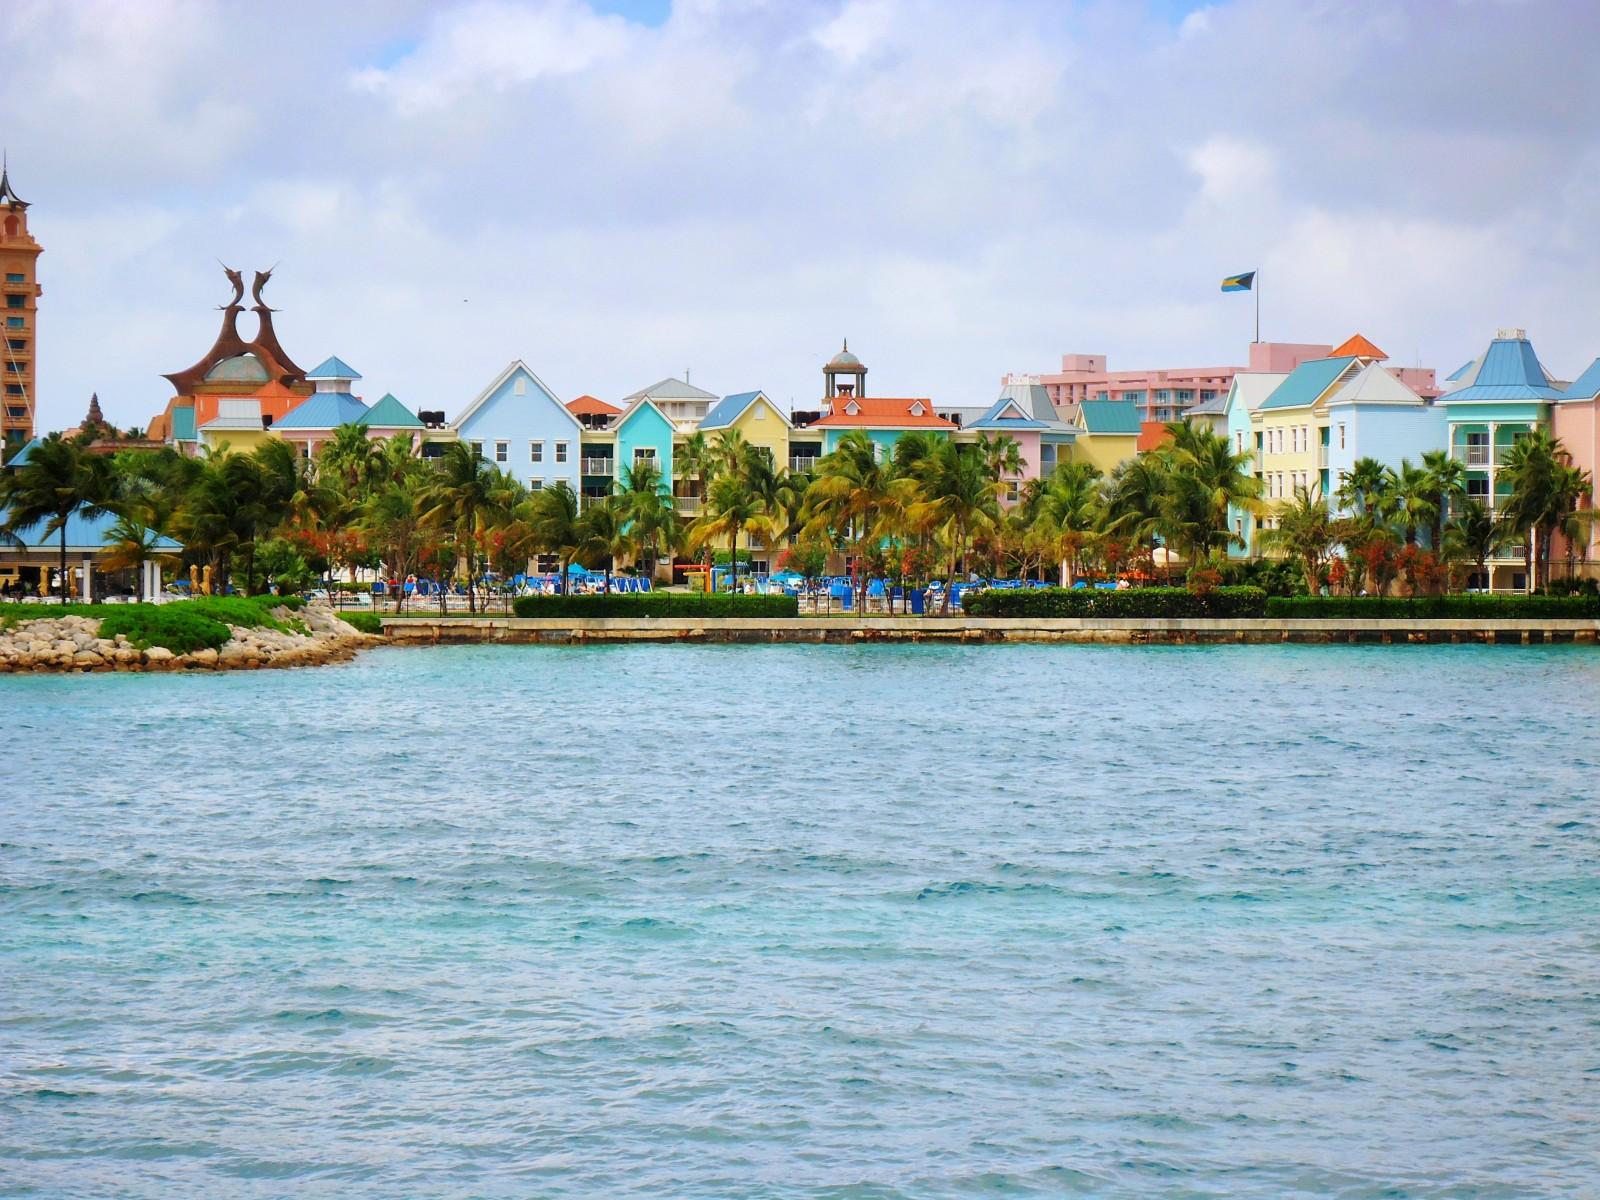 nassau bahamas rent a boat sail.me